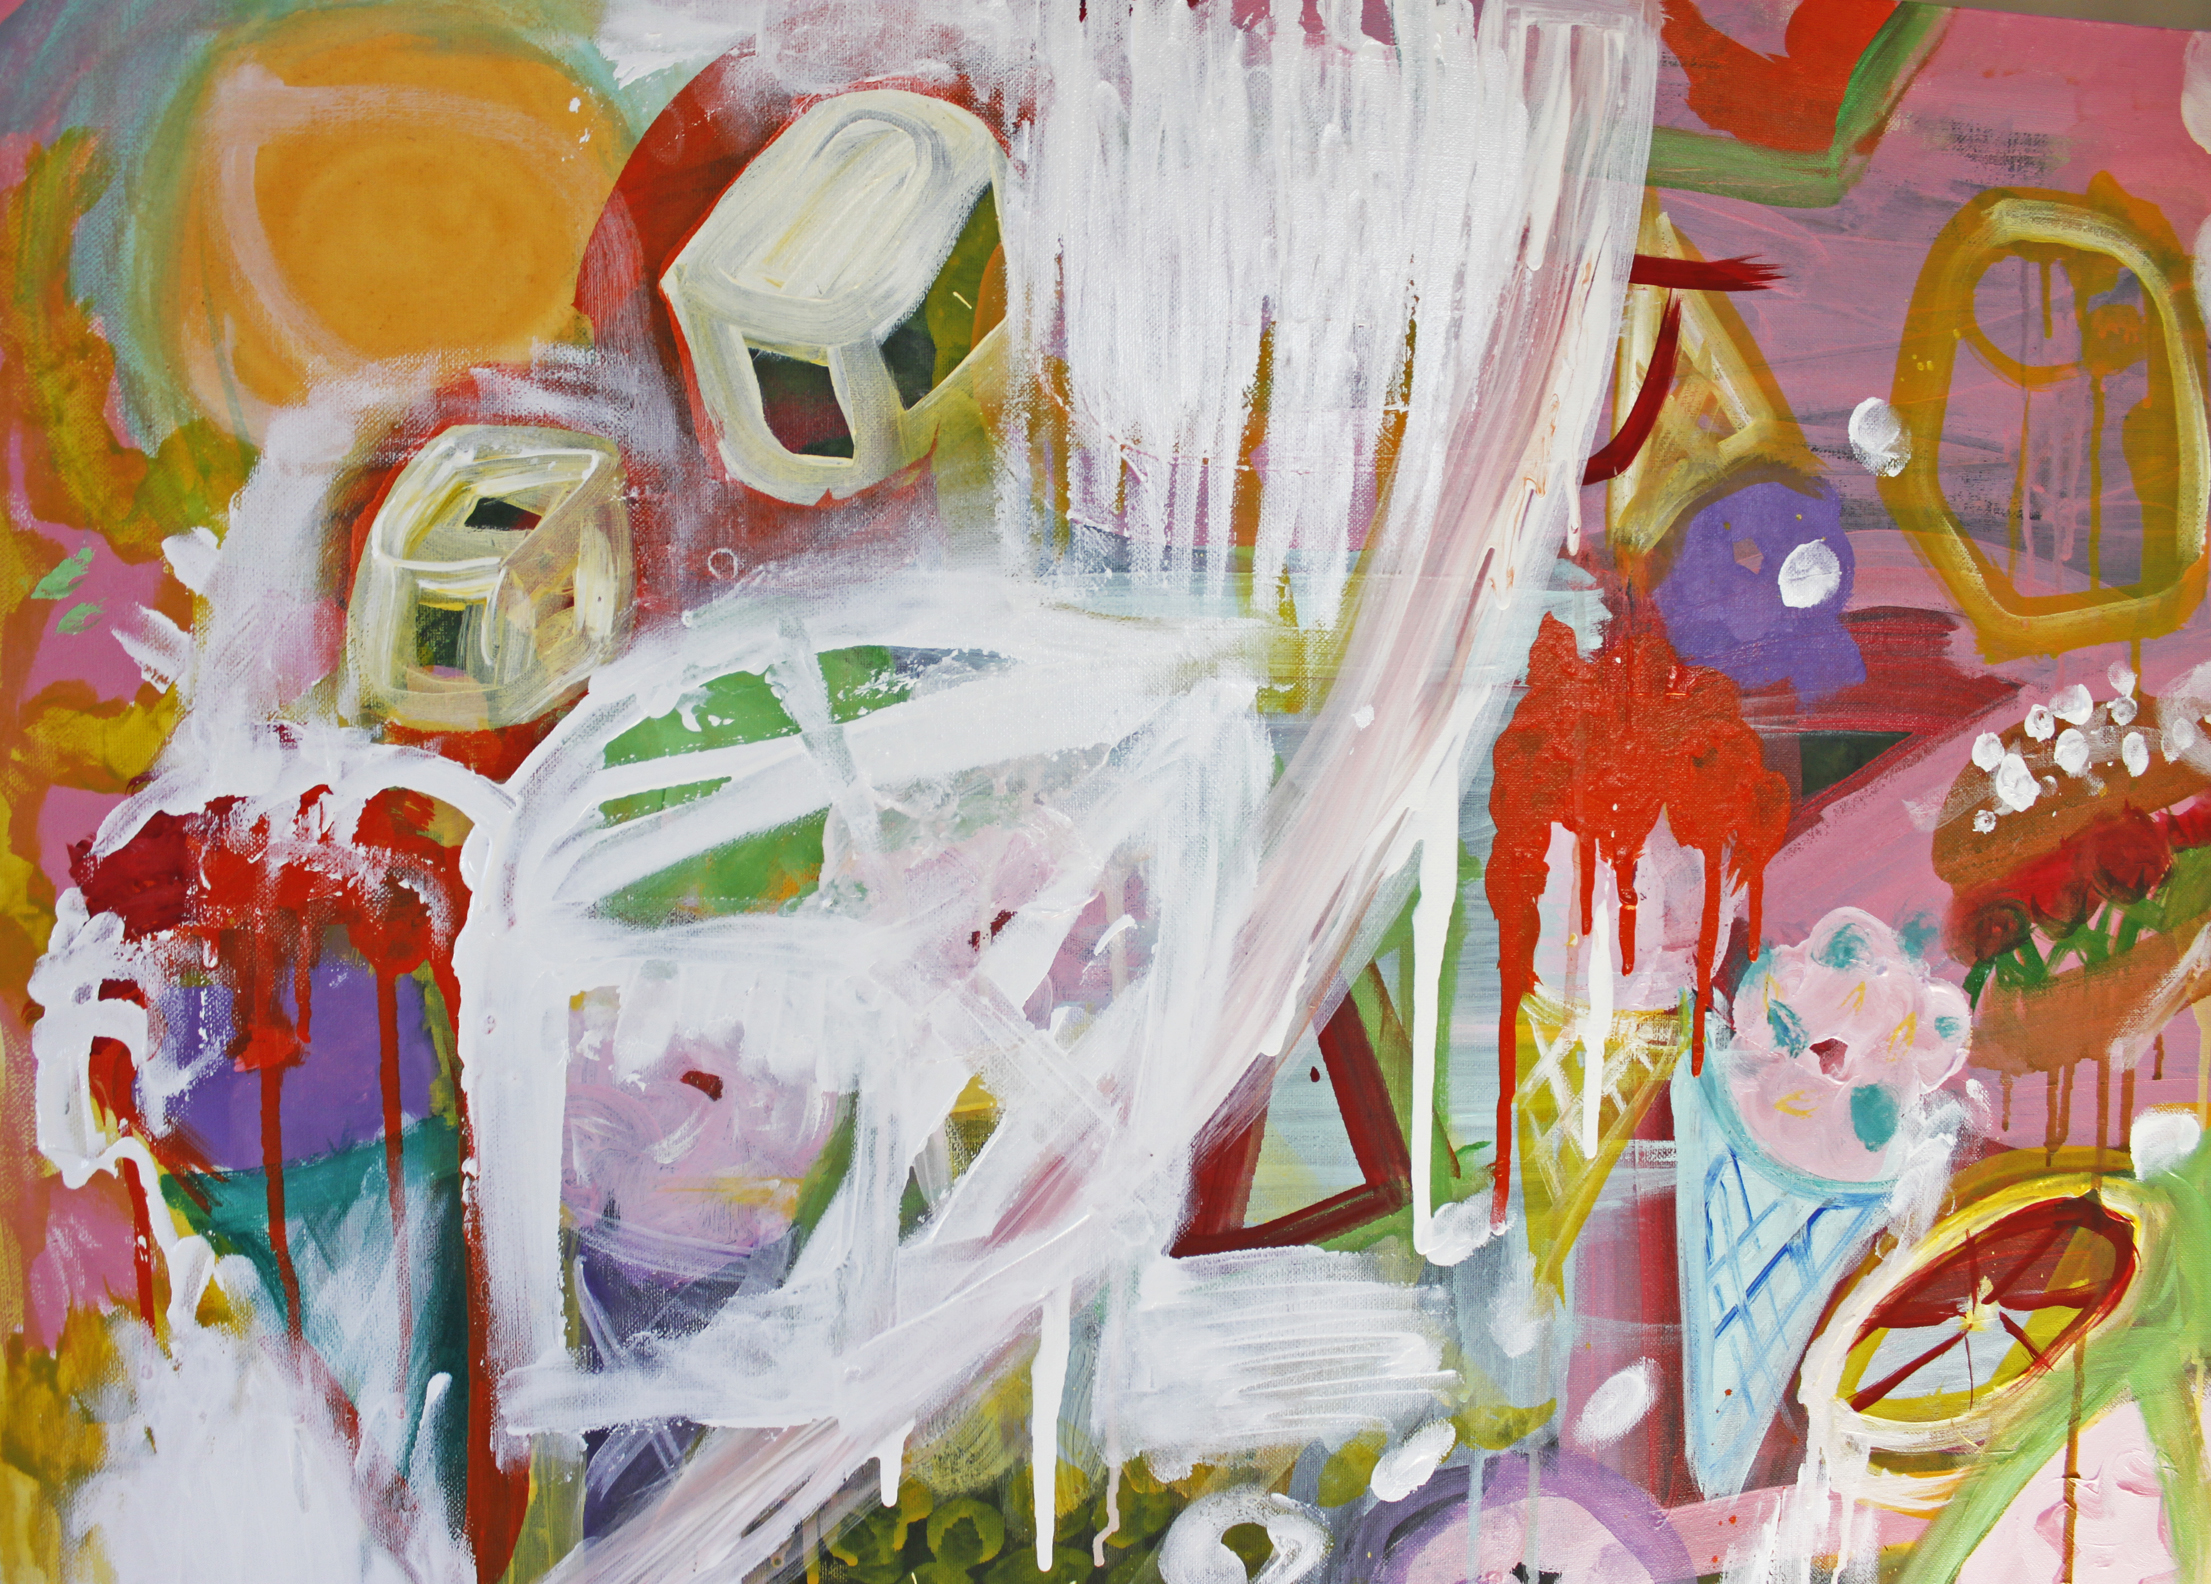 Lily Hahn-Stevens - The Corner Store Gallery